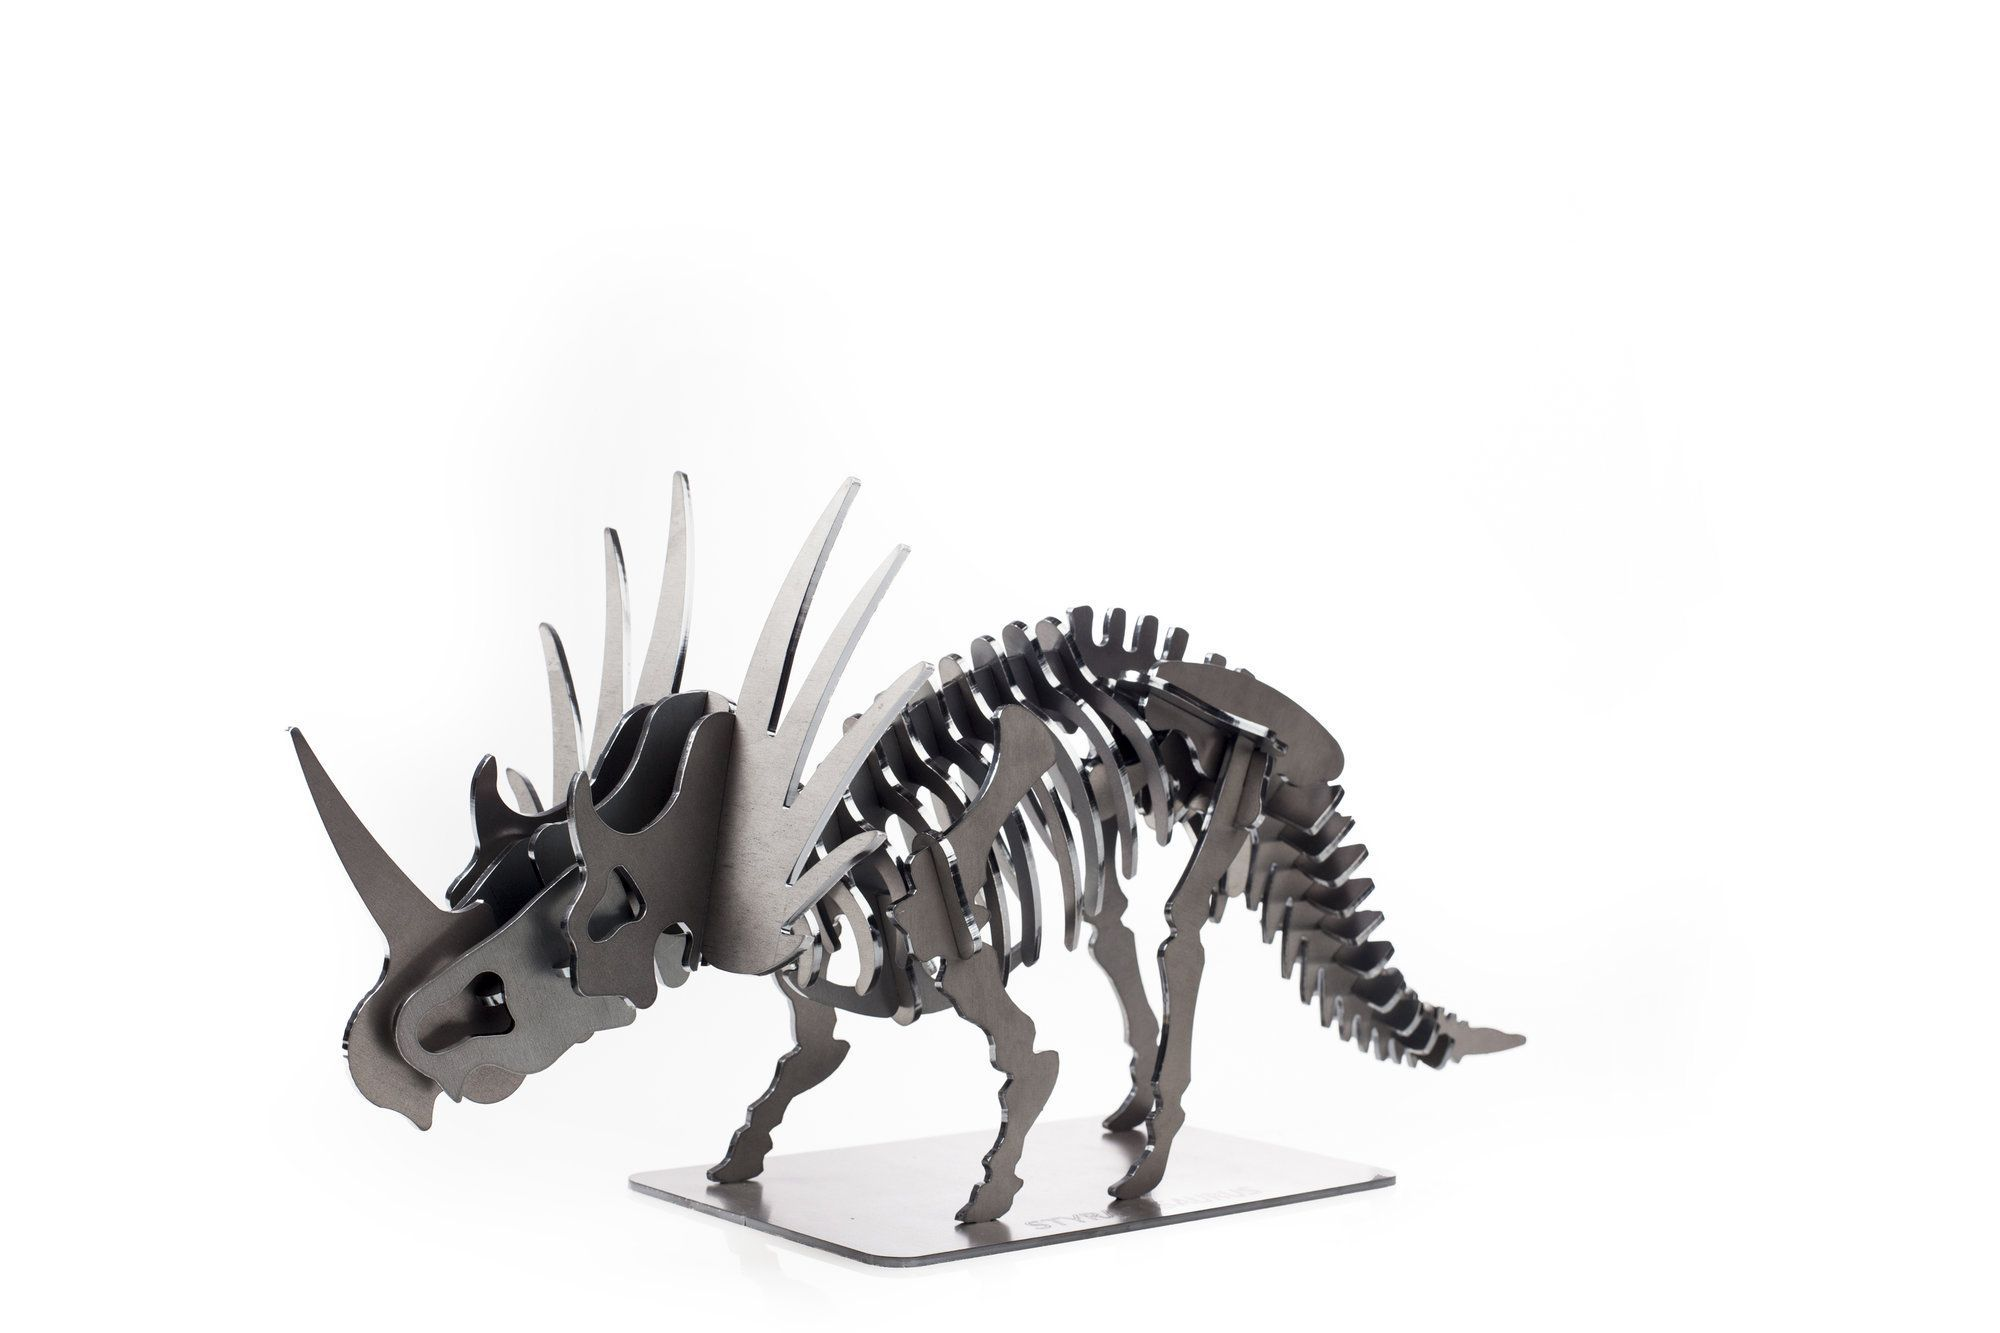 edward cardboard rhinoceros figure 3d puzzle diy kit paper